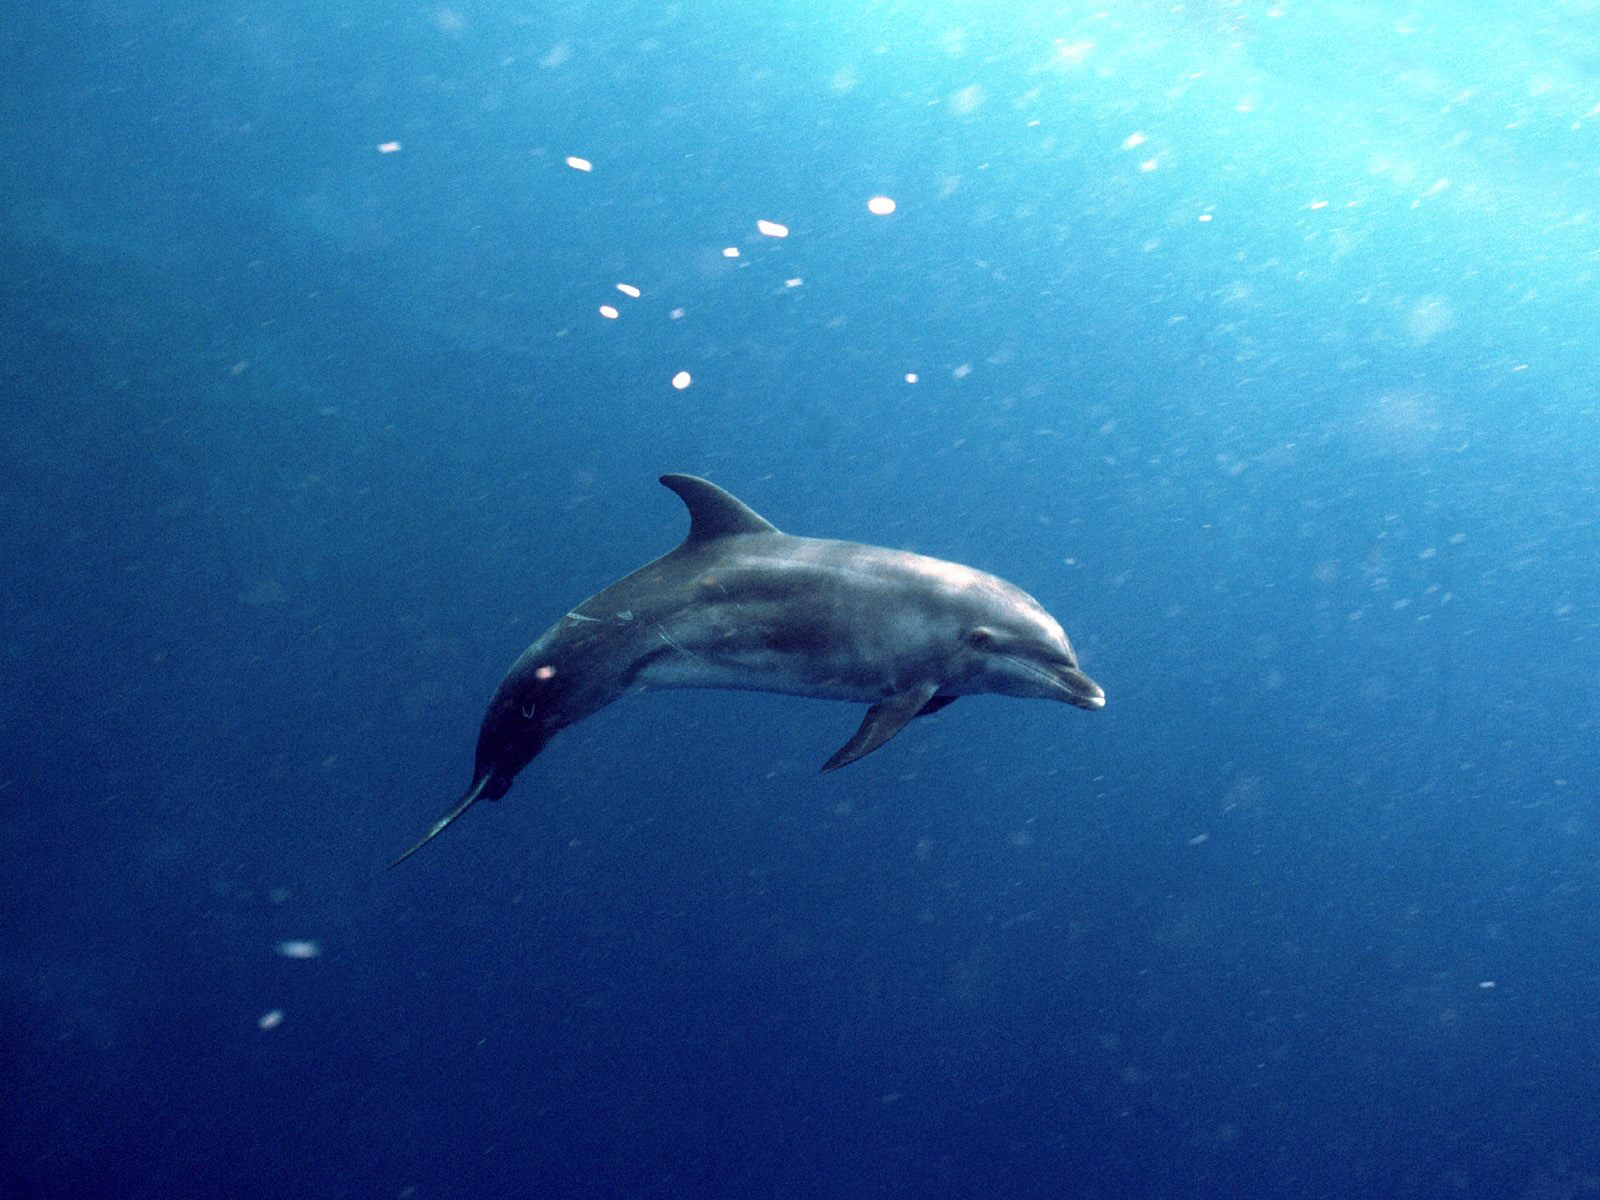 https://2.bp.blogspot.com/-PSZ-B_KePUo/Tg29EsIyuPI/AAAAAAAAA9o/qiAmLcToDVg/s1600/Underwater%2BWallpaper%2B%25252836%252529.jpg